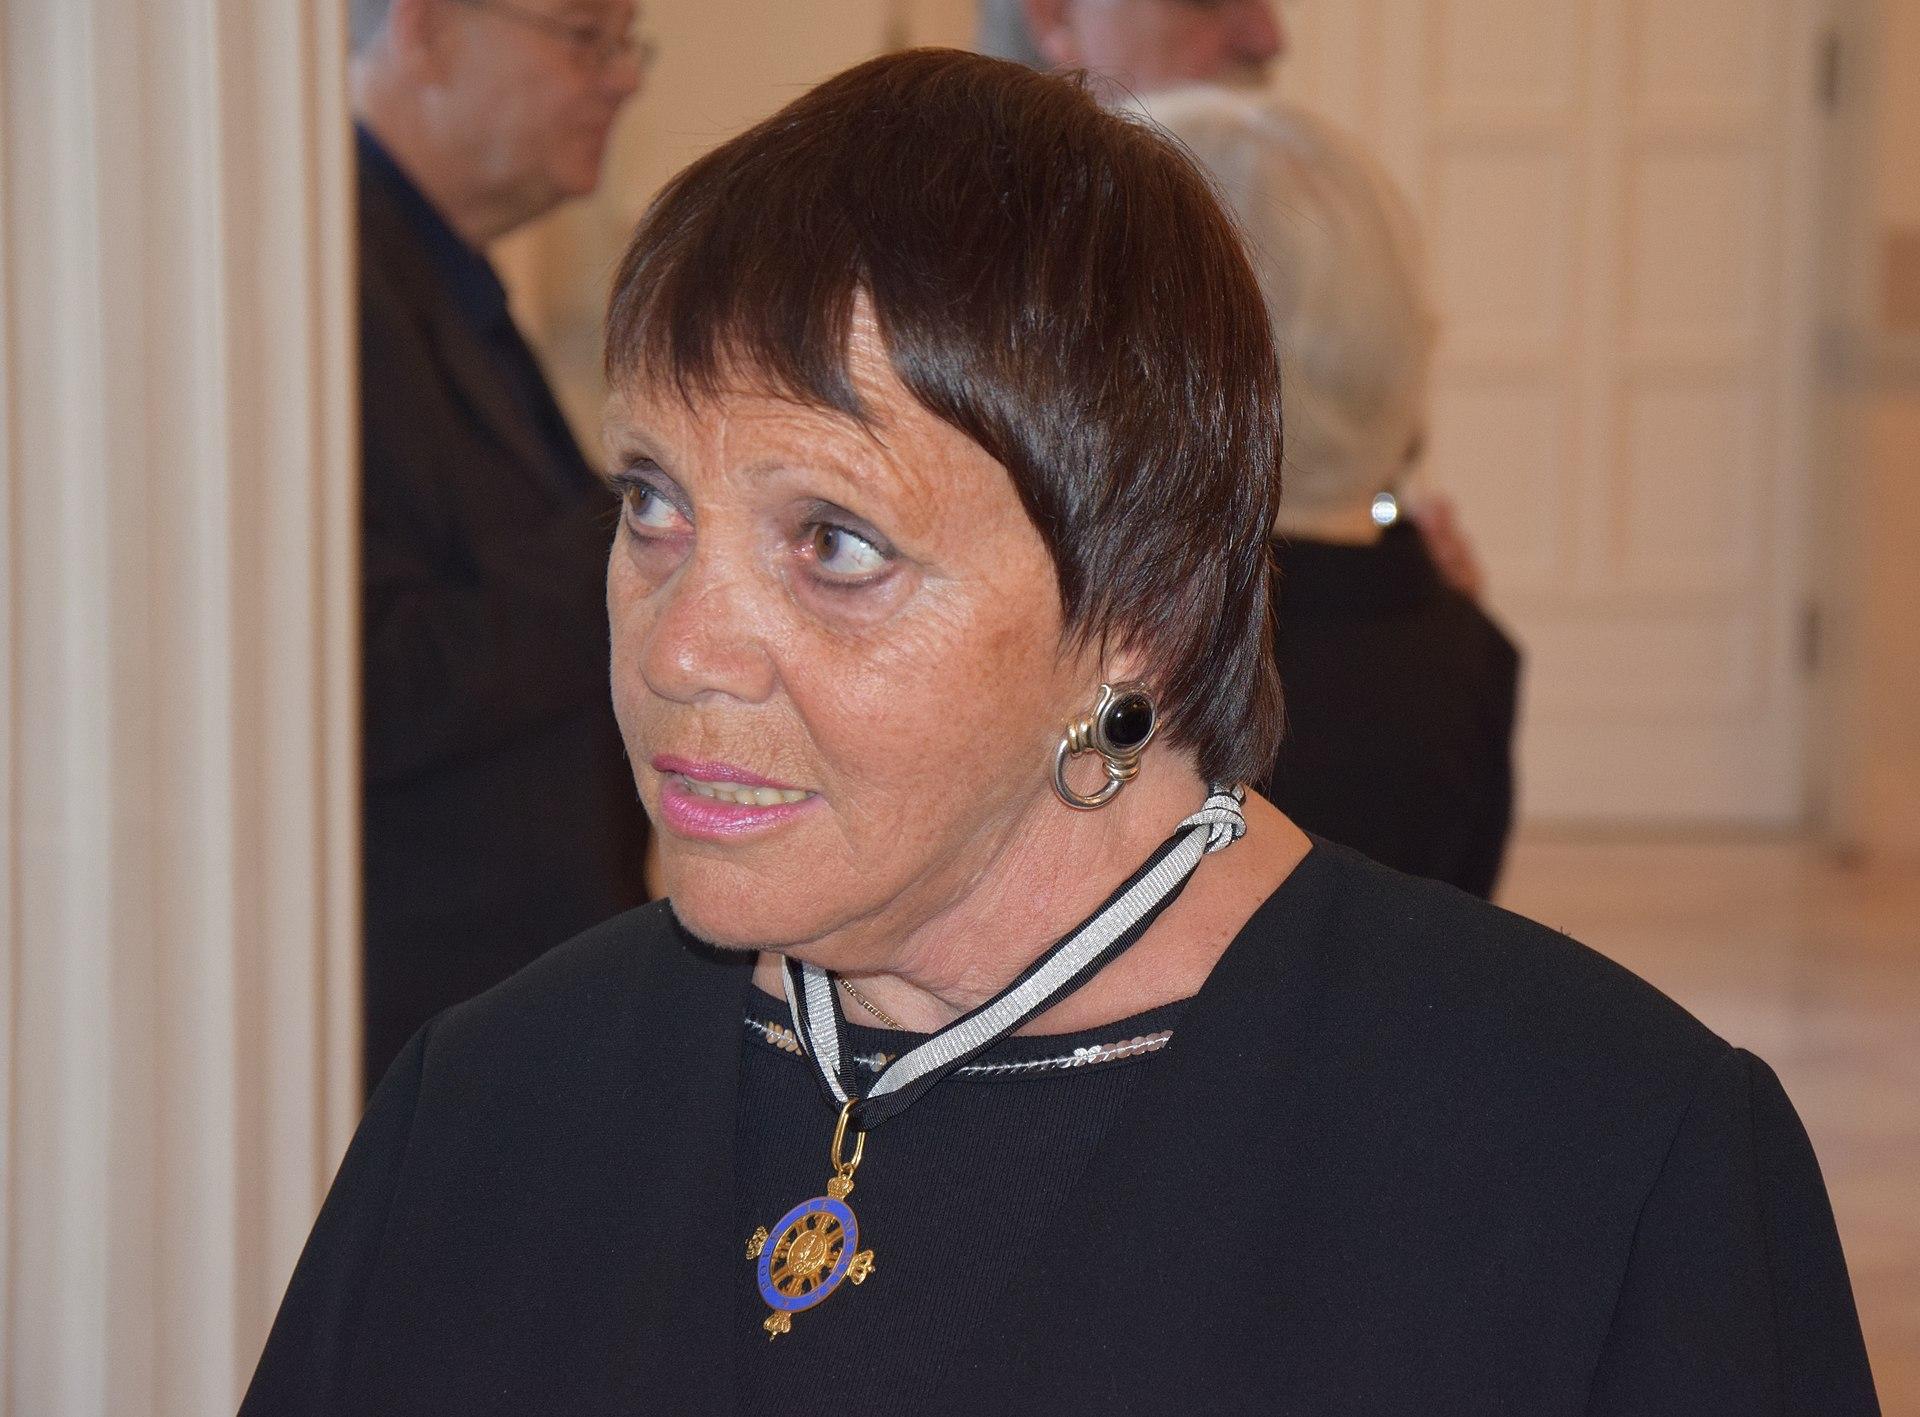 Brigitte Fassbänder